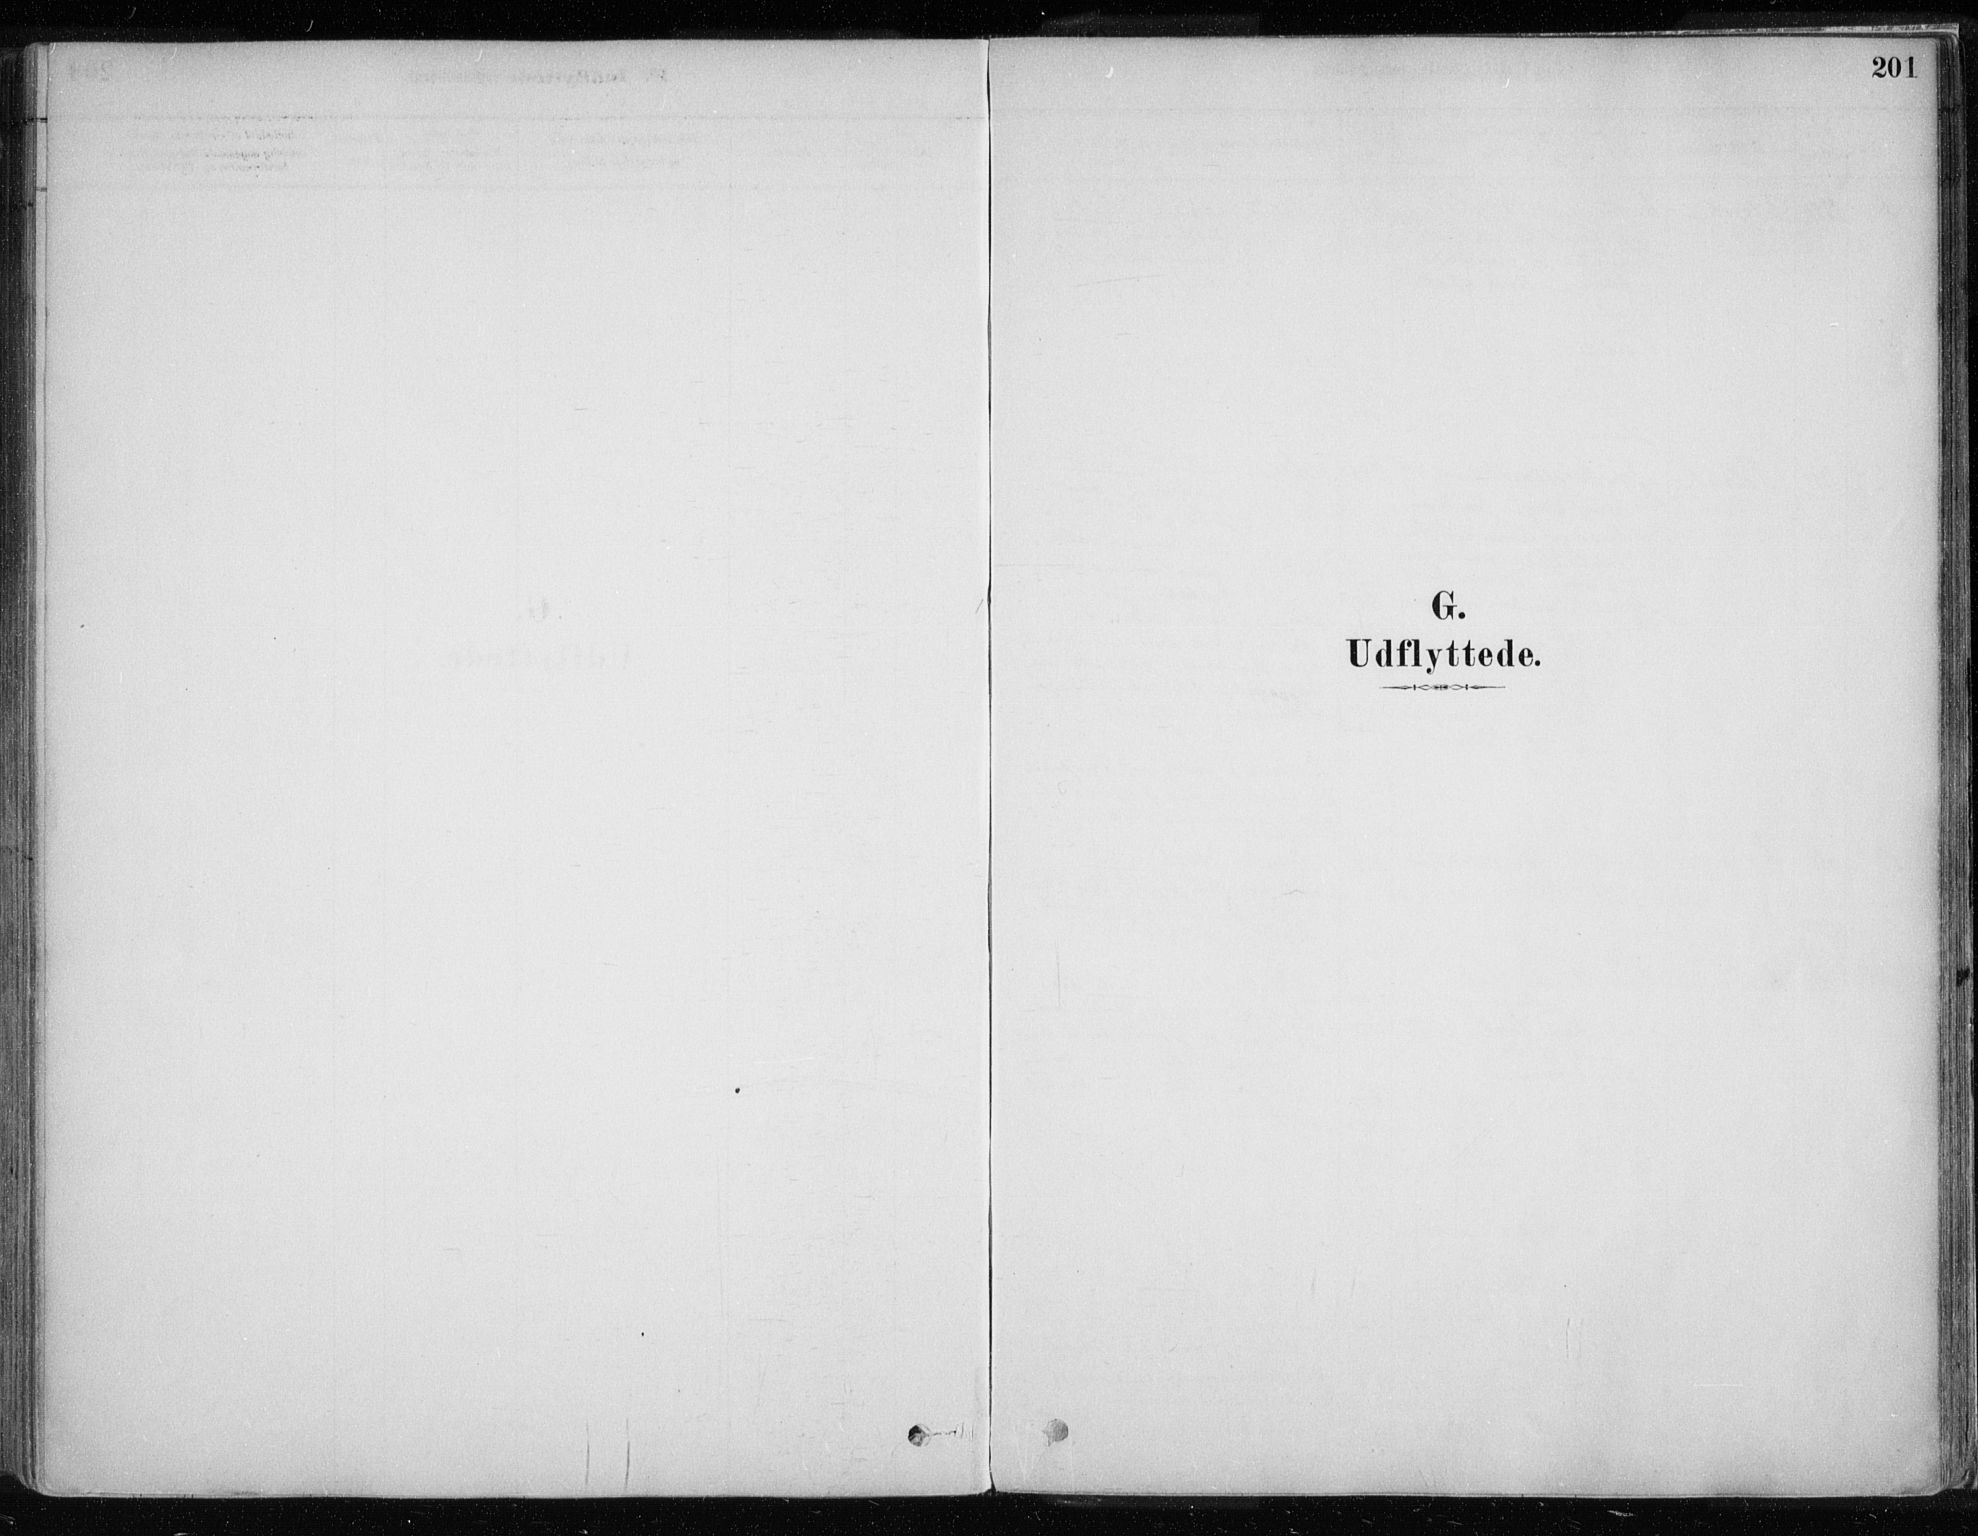 SATØ, Karasjok sokneprestkontor, H/Ha/L0002kirke: Ministerialbok nr. 2, 1885-1906, s. 201